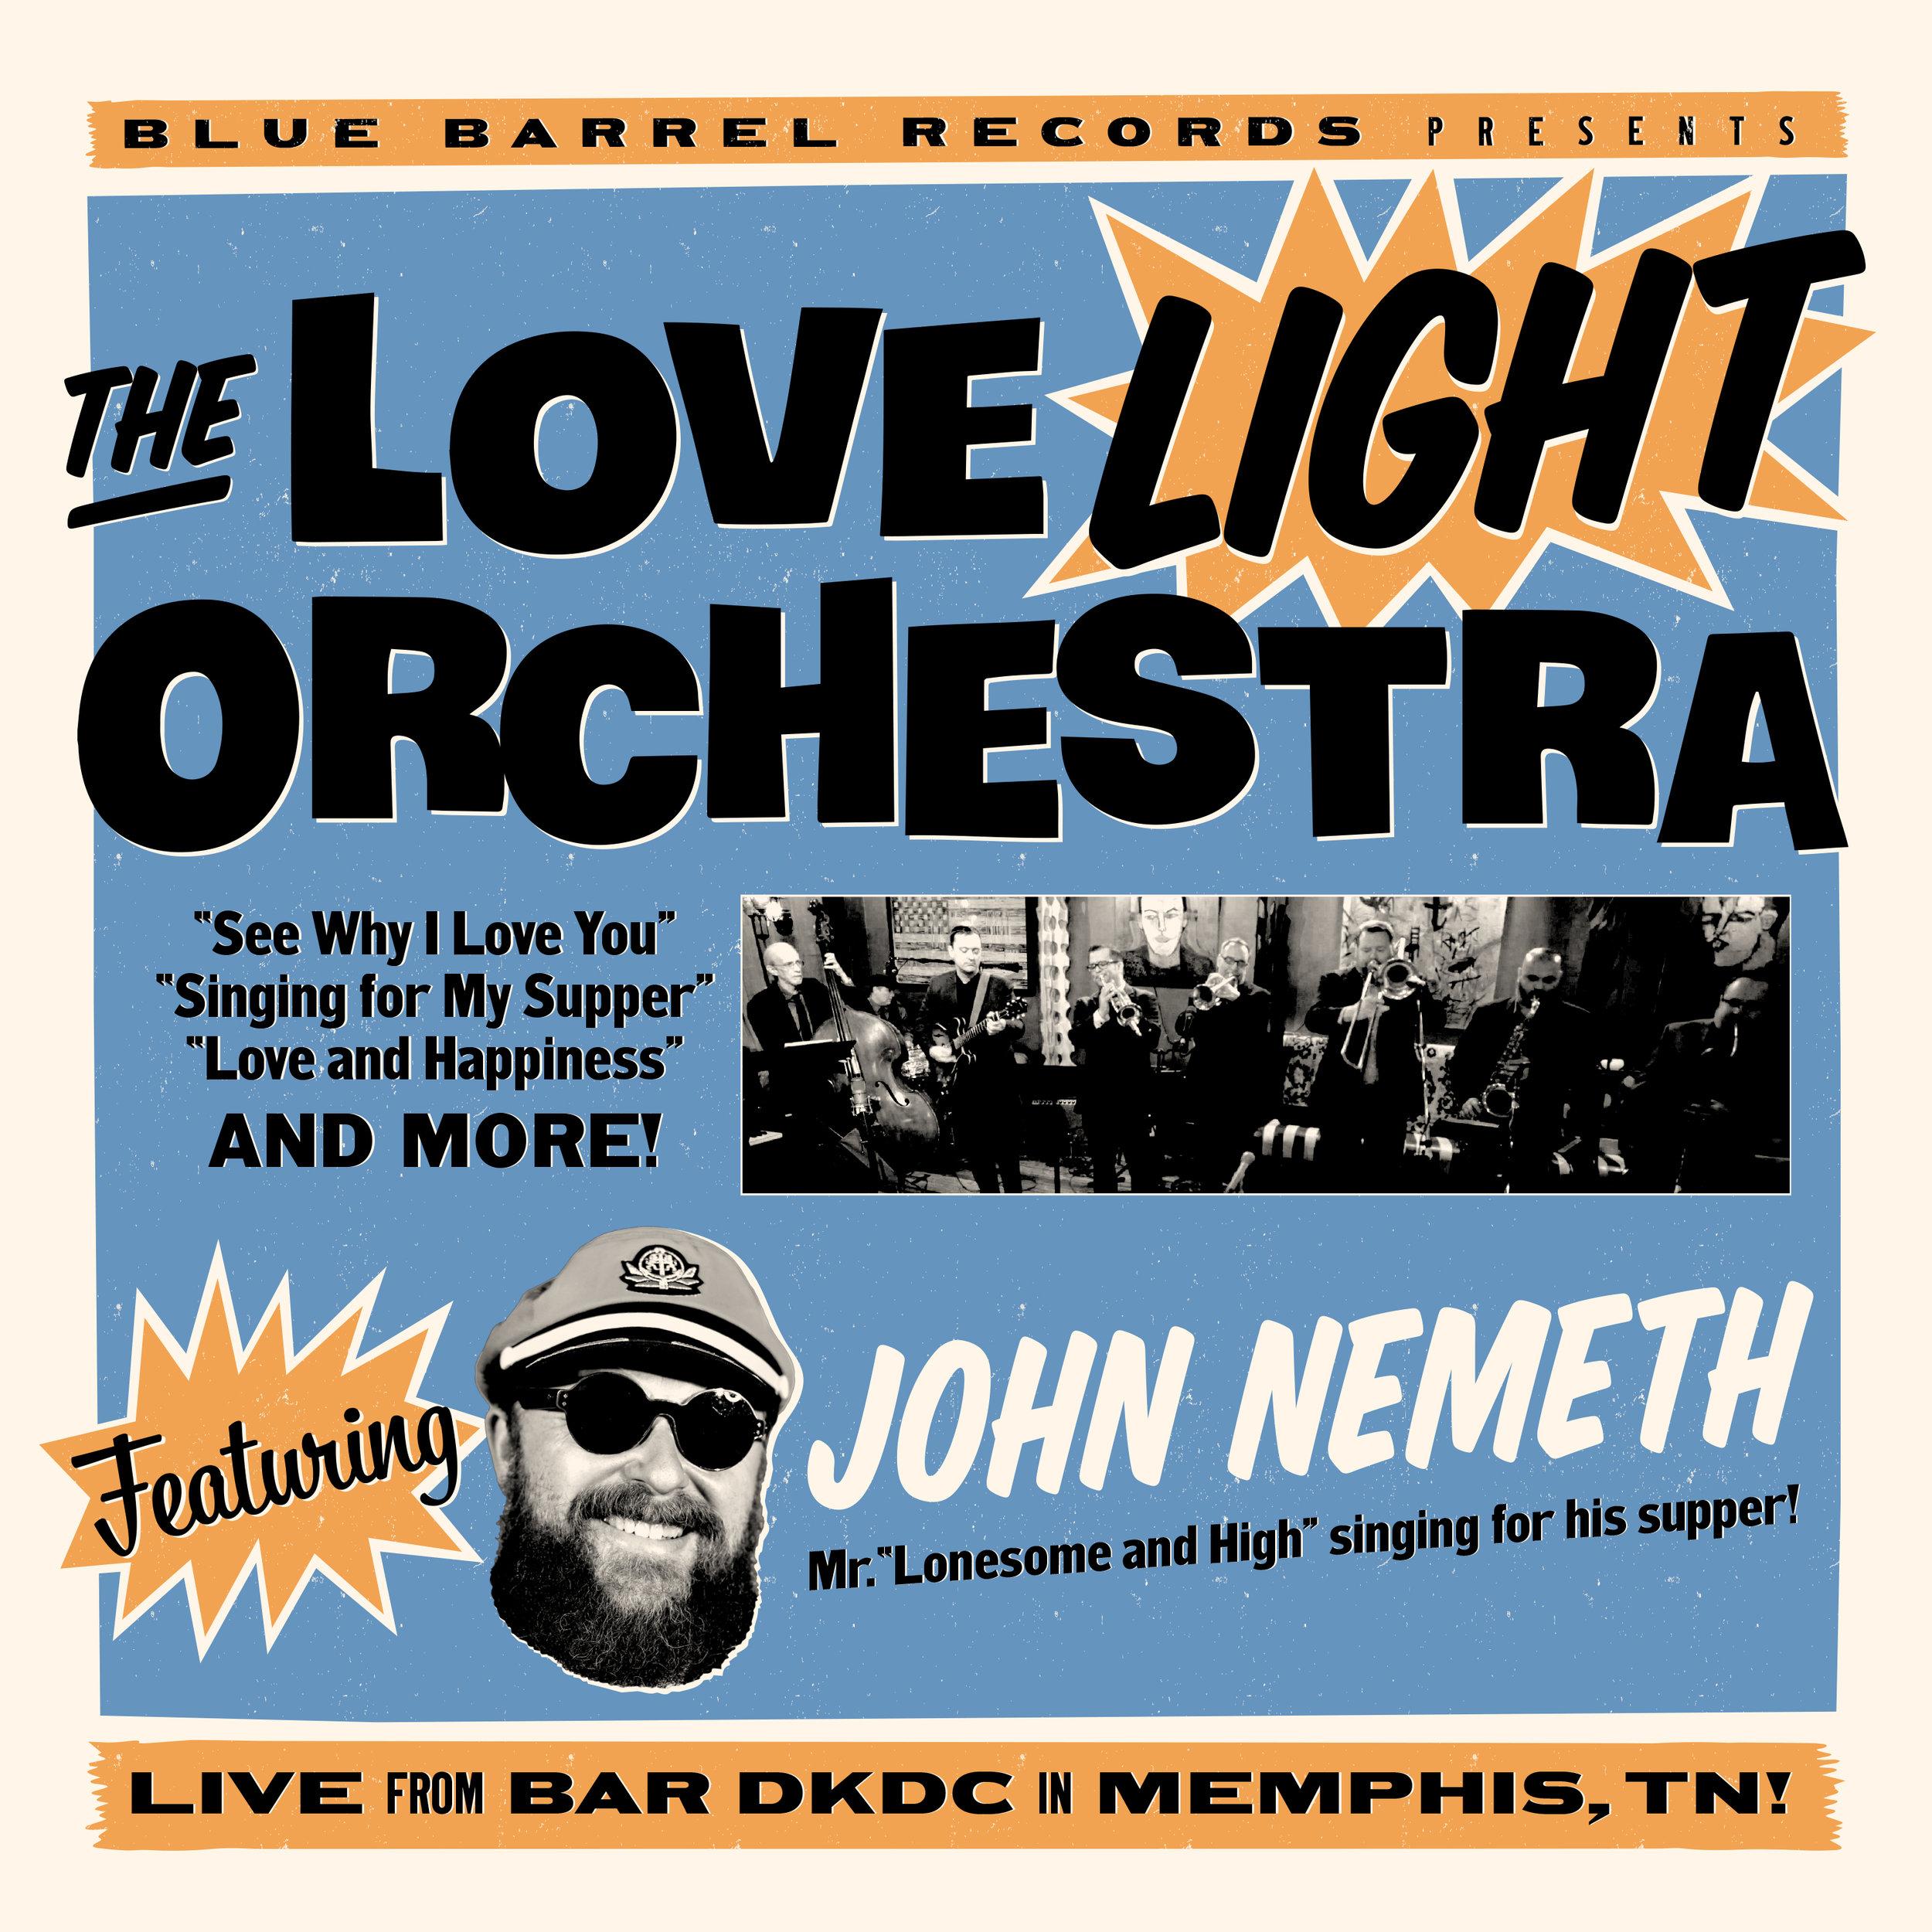 love-light-orchestra-featuring-john-nemeth-3000.jpg